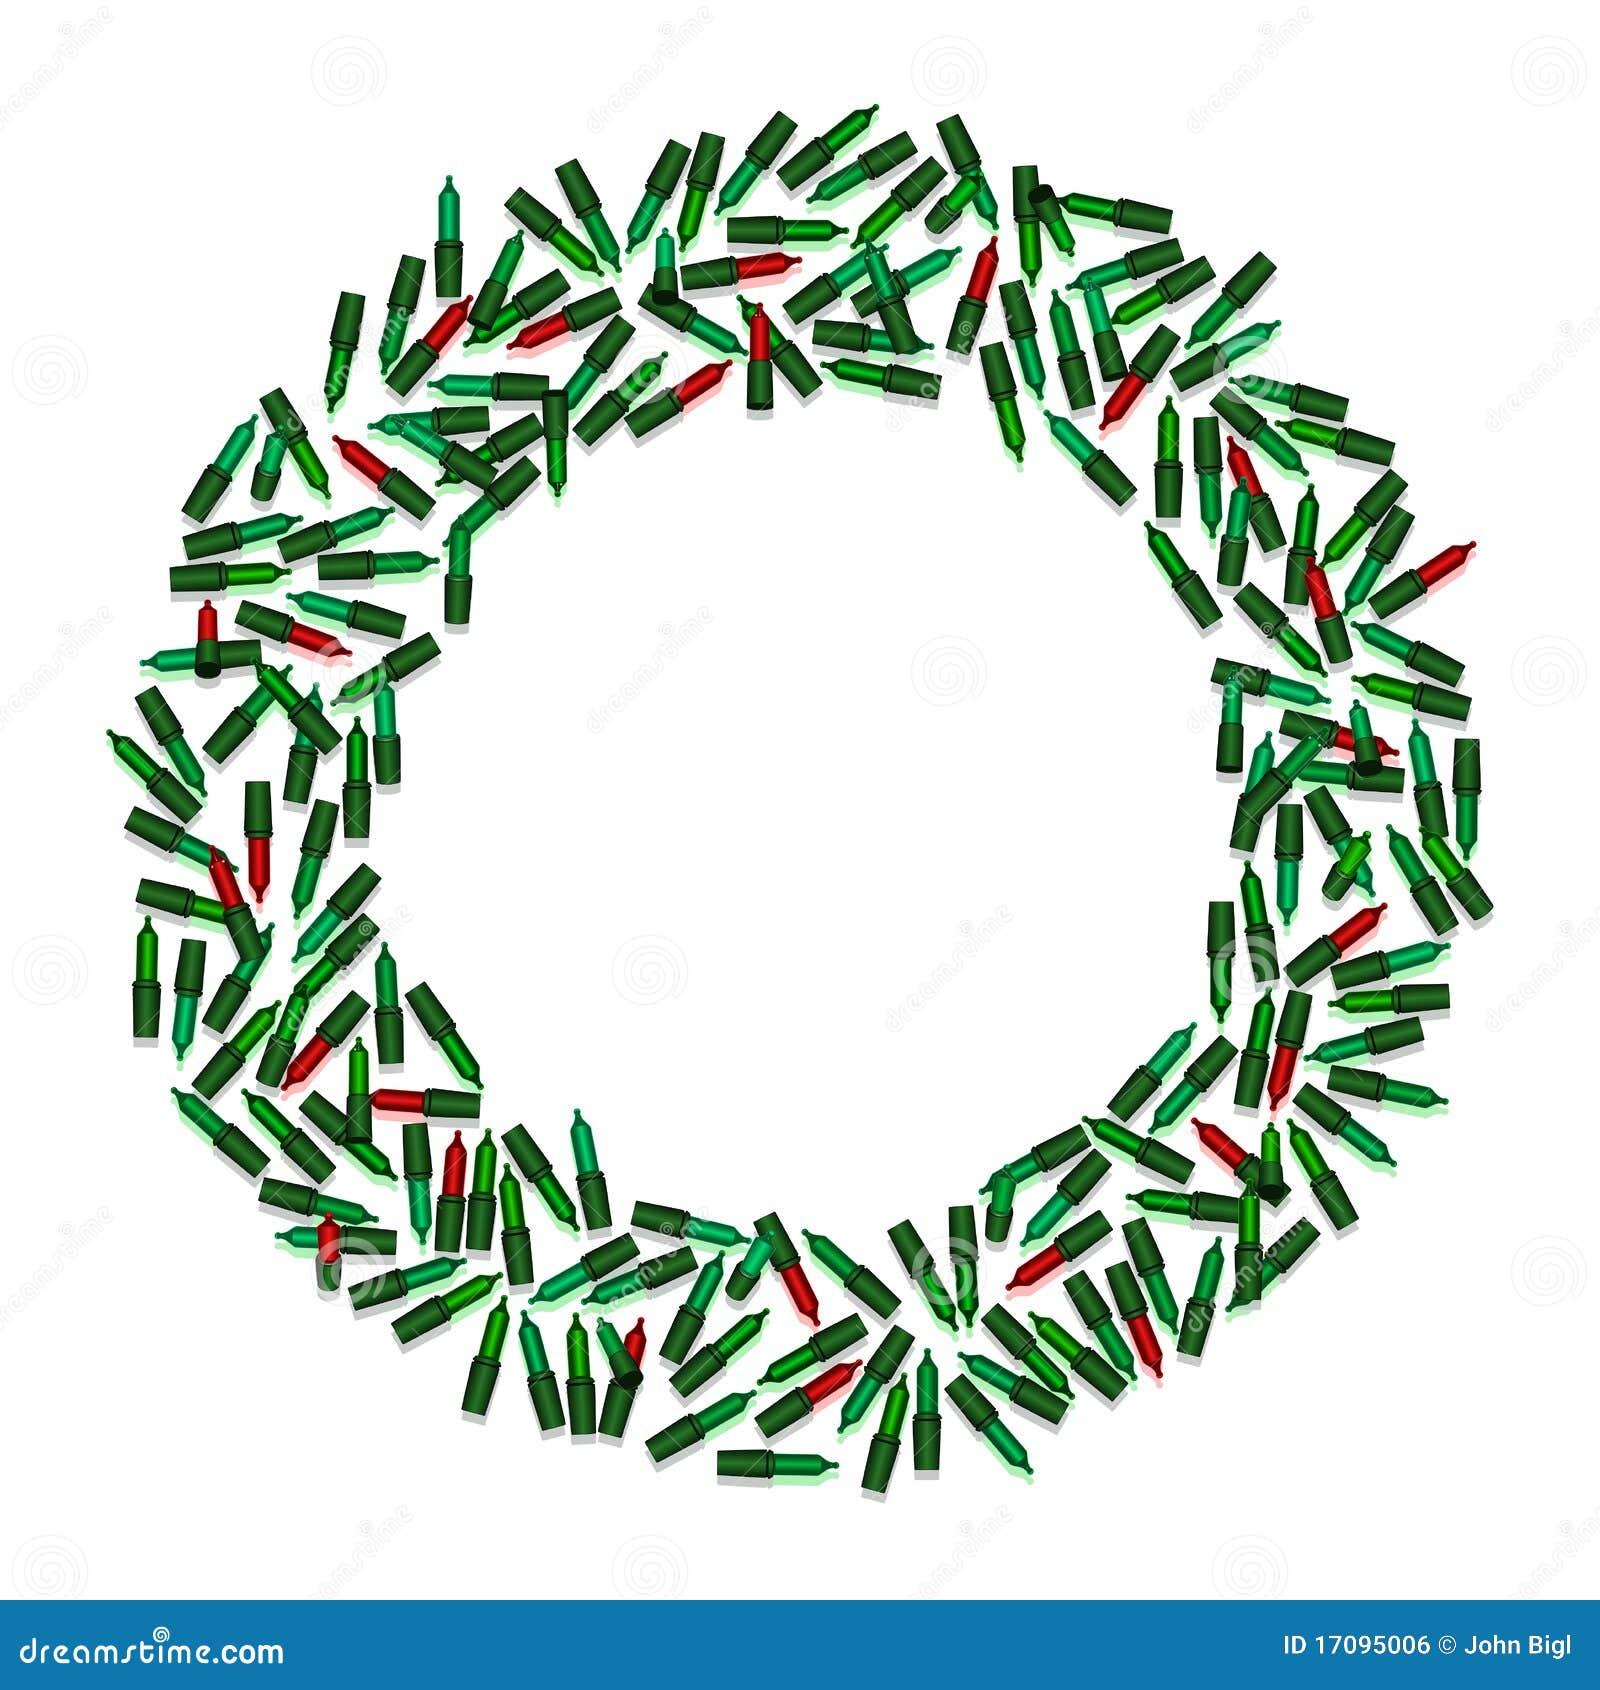 Christmas Light Wreath Royalty Free Stock Image - Image: 17095006